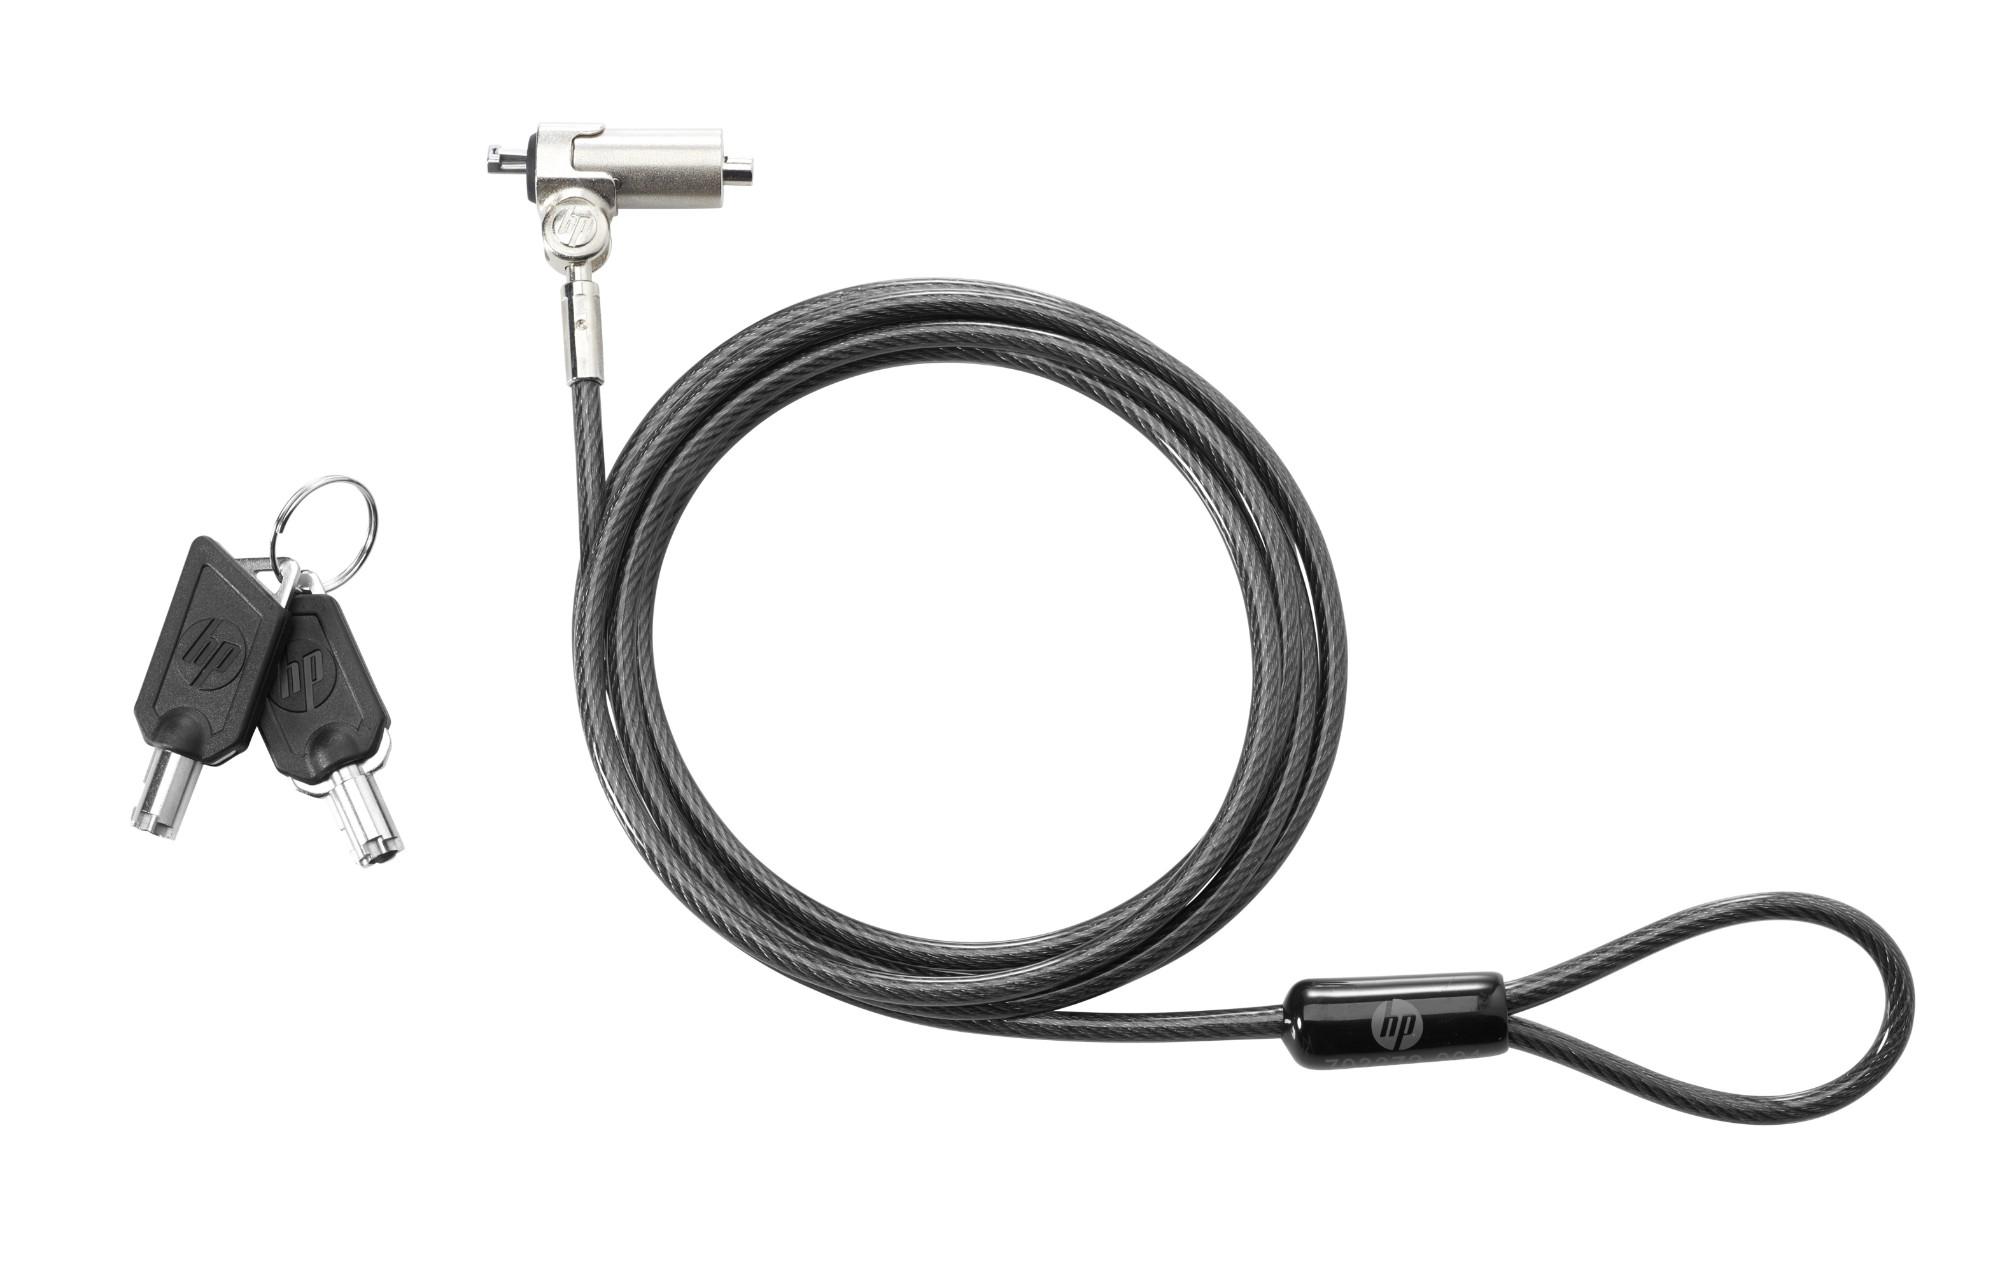 Hp Kvm Cables